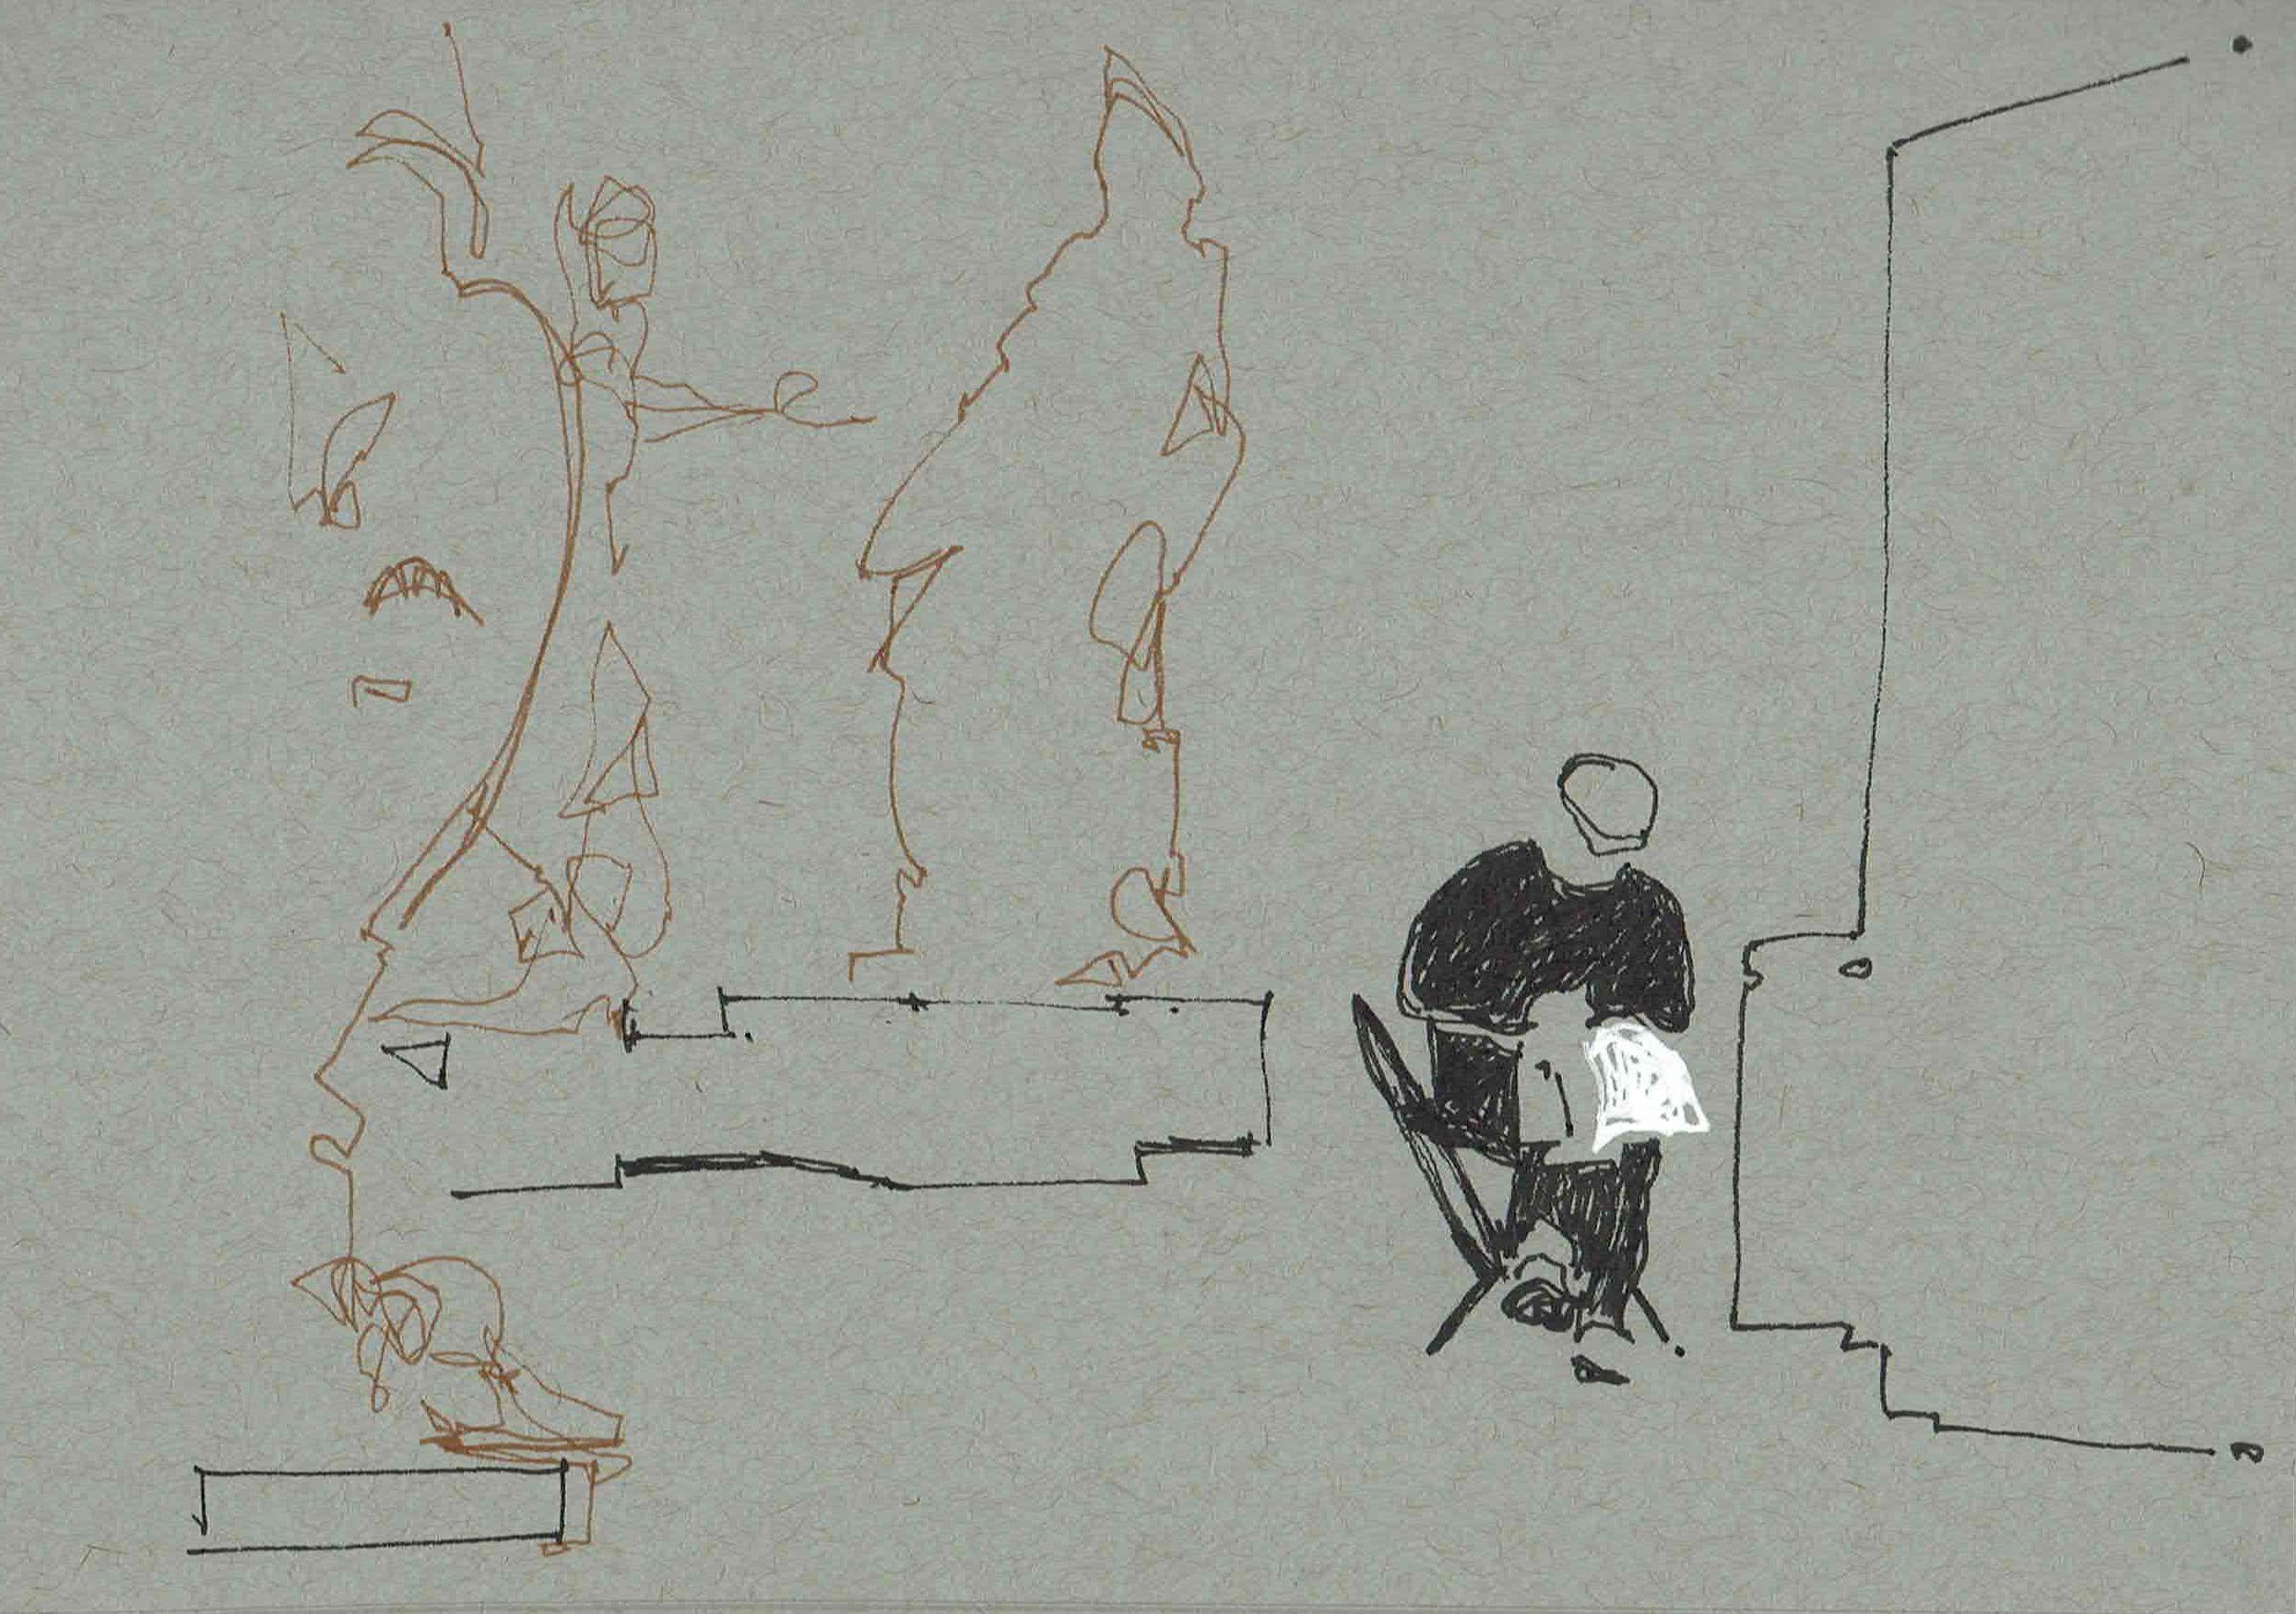 20170108 5 sketching among statues.JPG